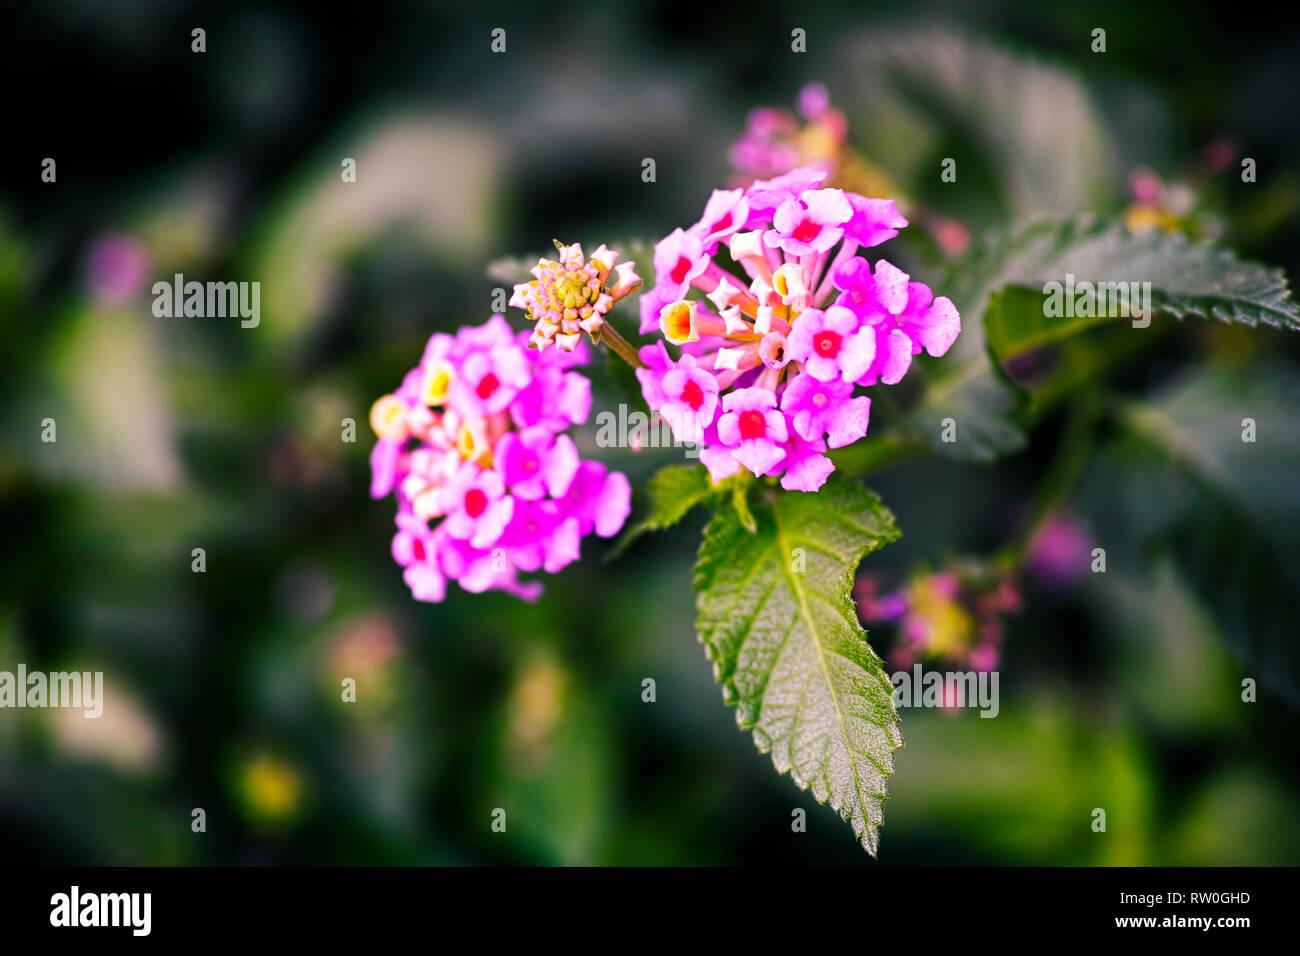 Pink lantana flowering. Close up. - Stock Image